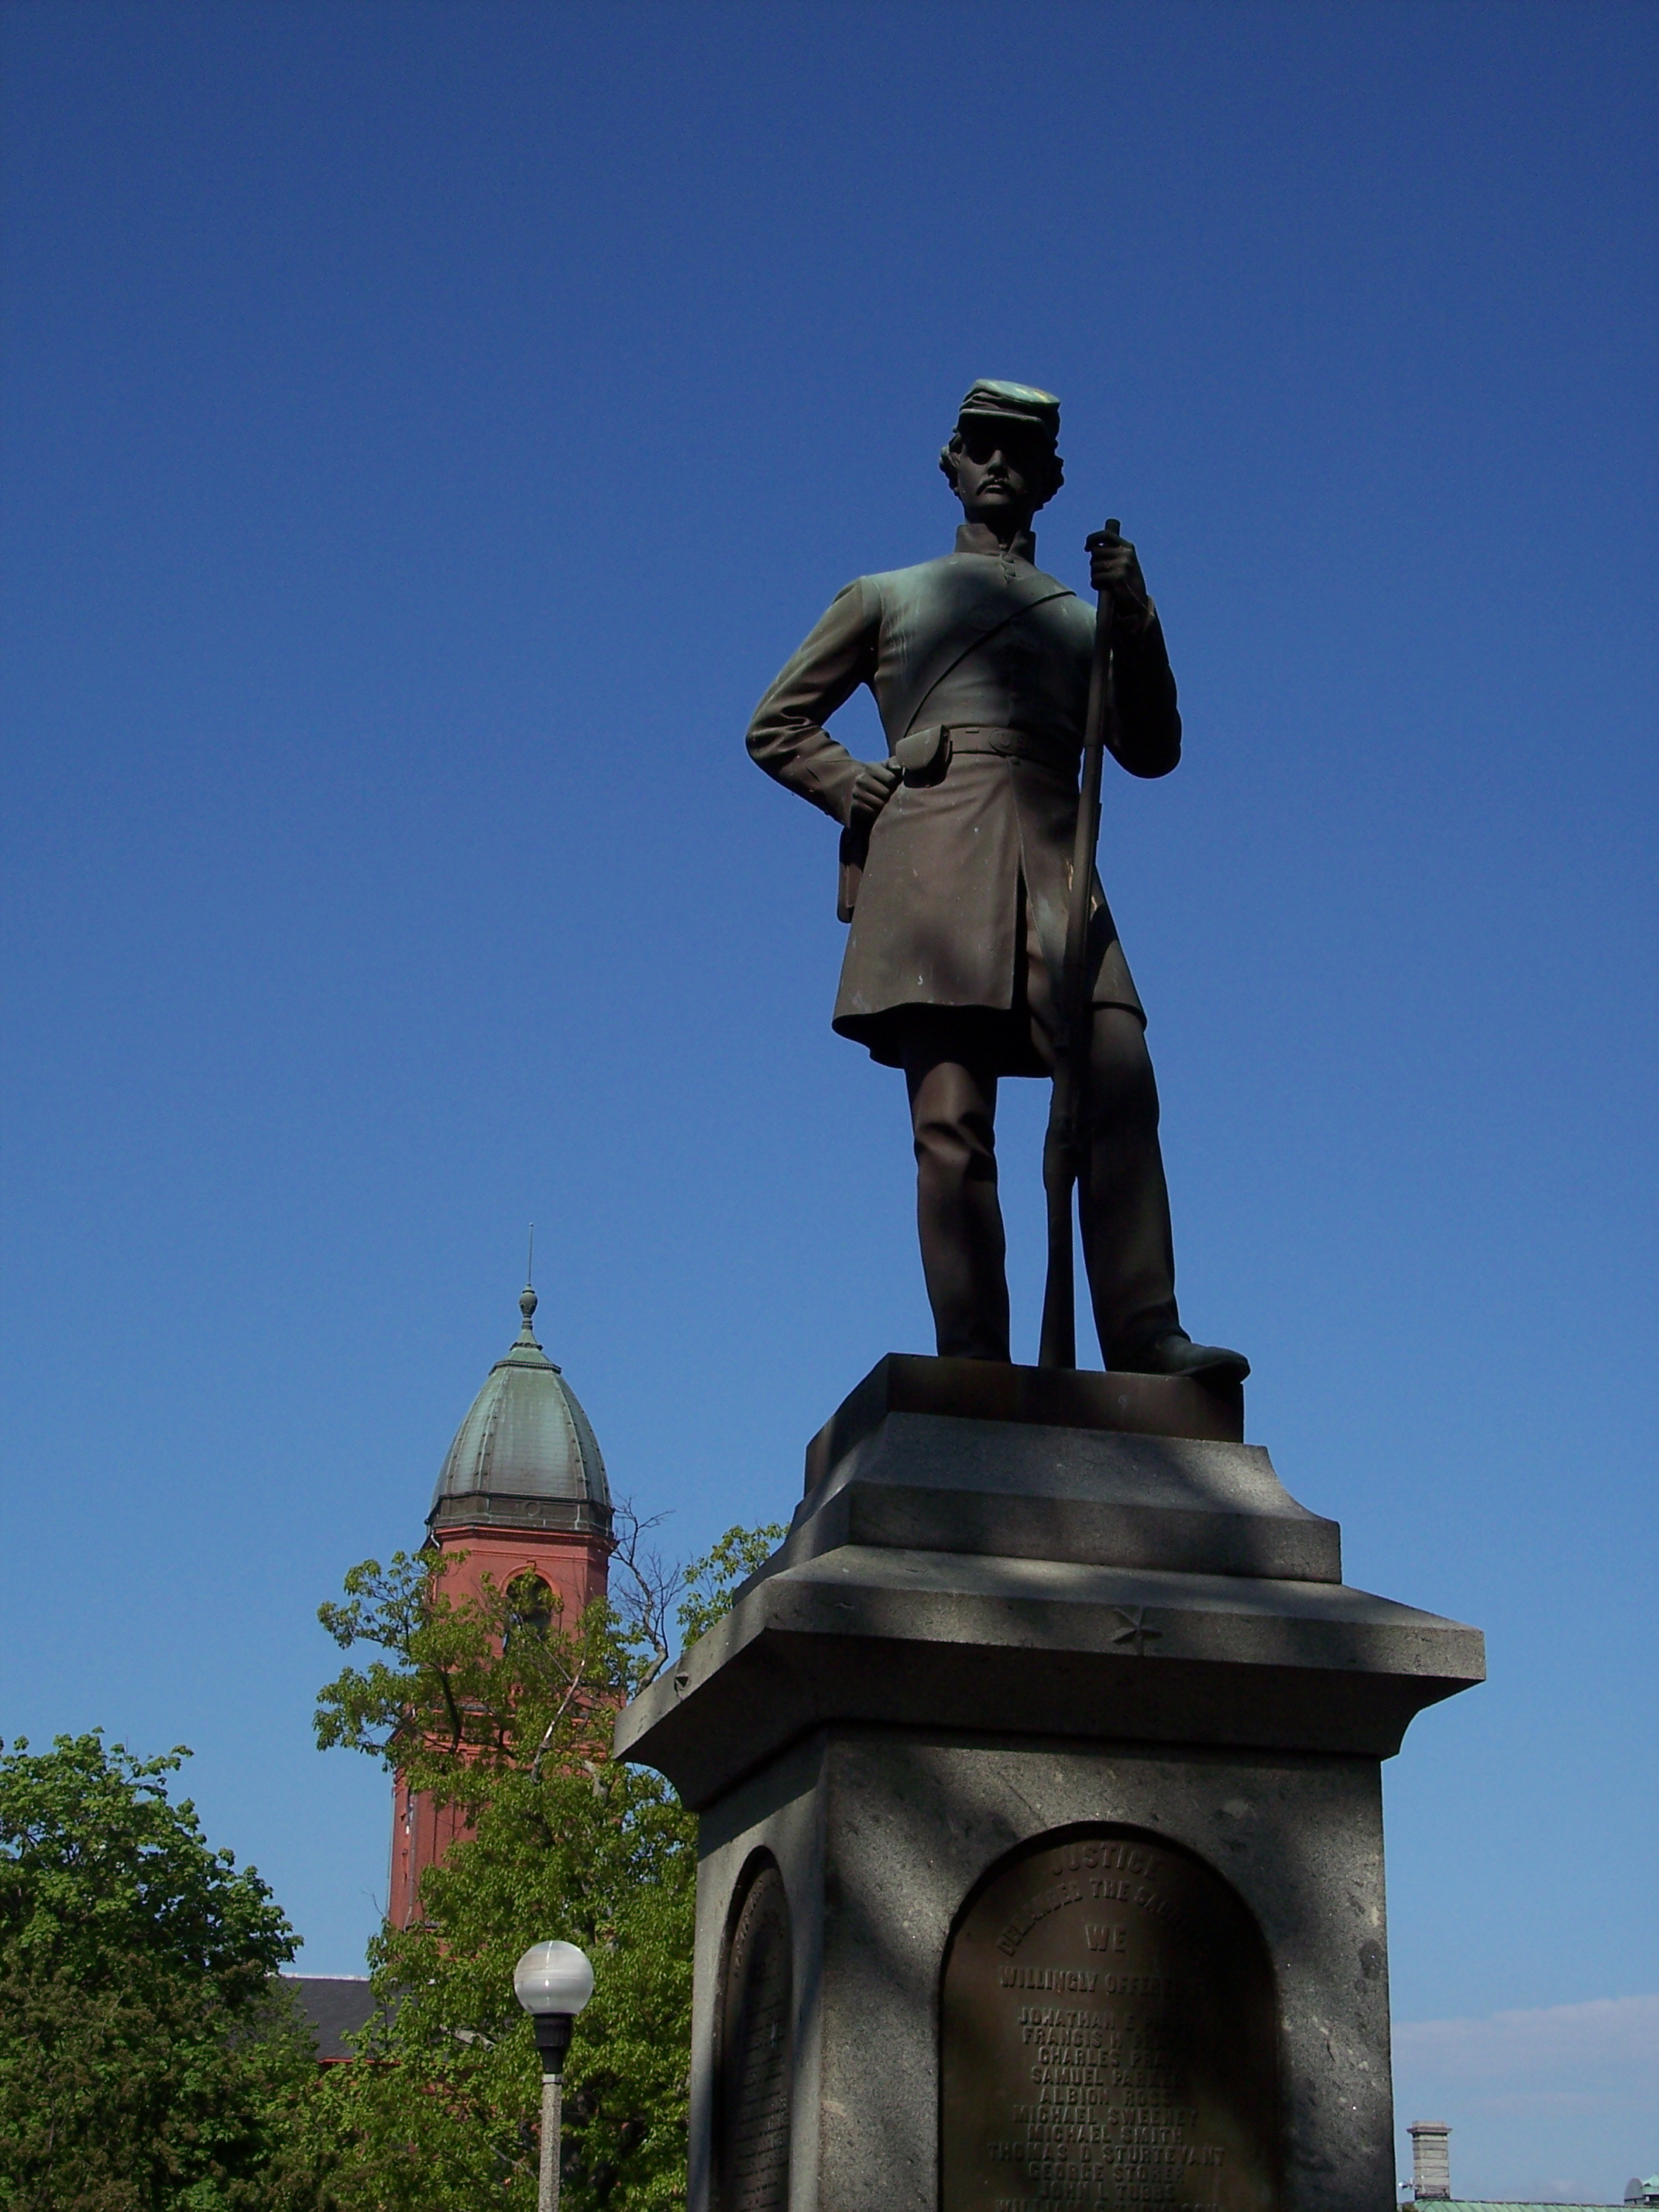 lewiston civil war statue.jpg